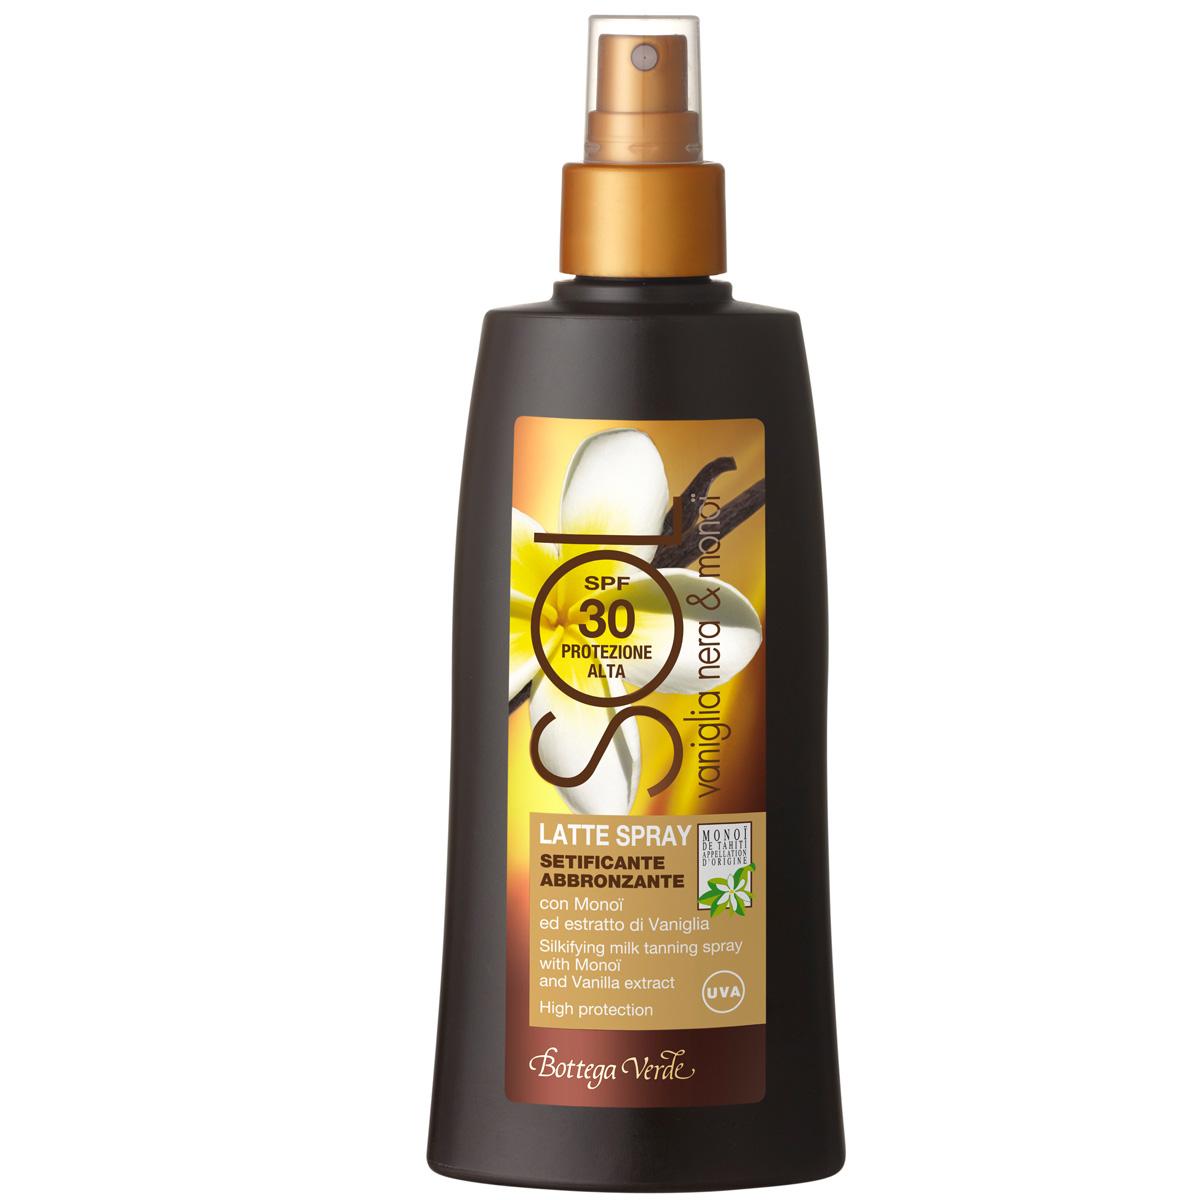 Lapte spray  pentru bronz intens, cu monoi si extract de vanilie - Sol Vaniglia Nera e Monoi , 200 ML